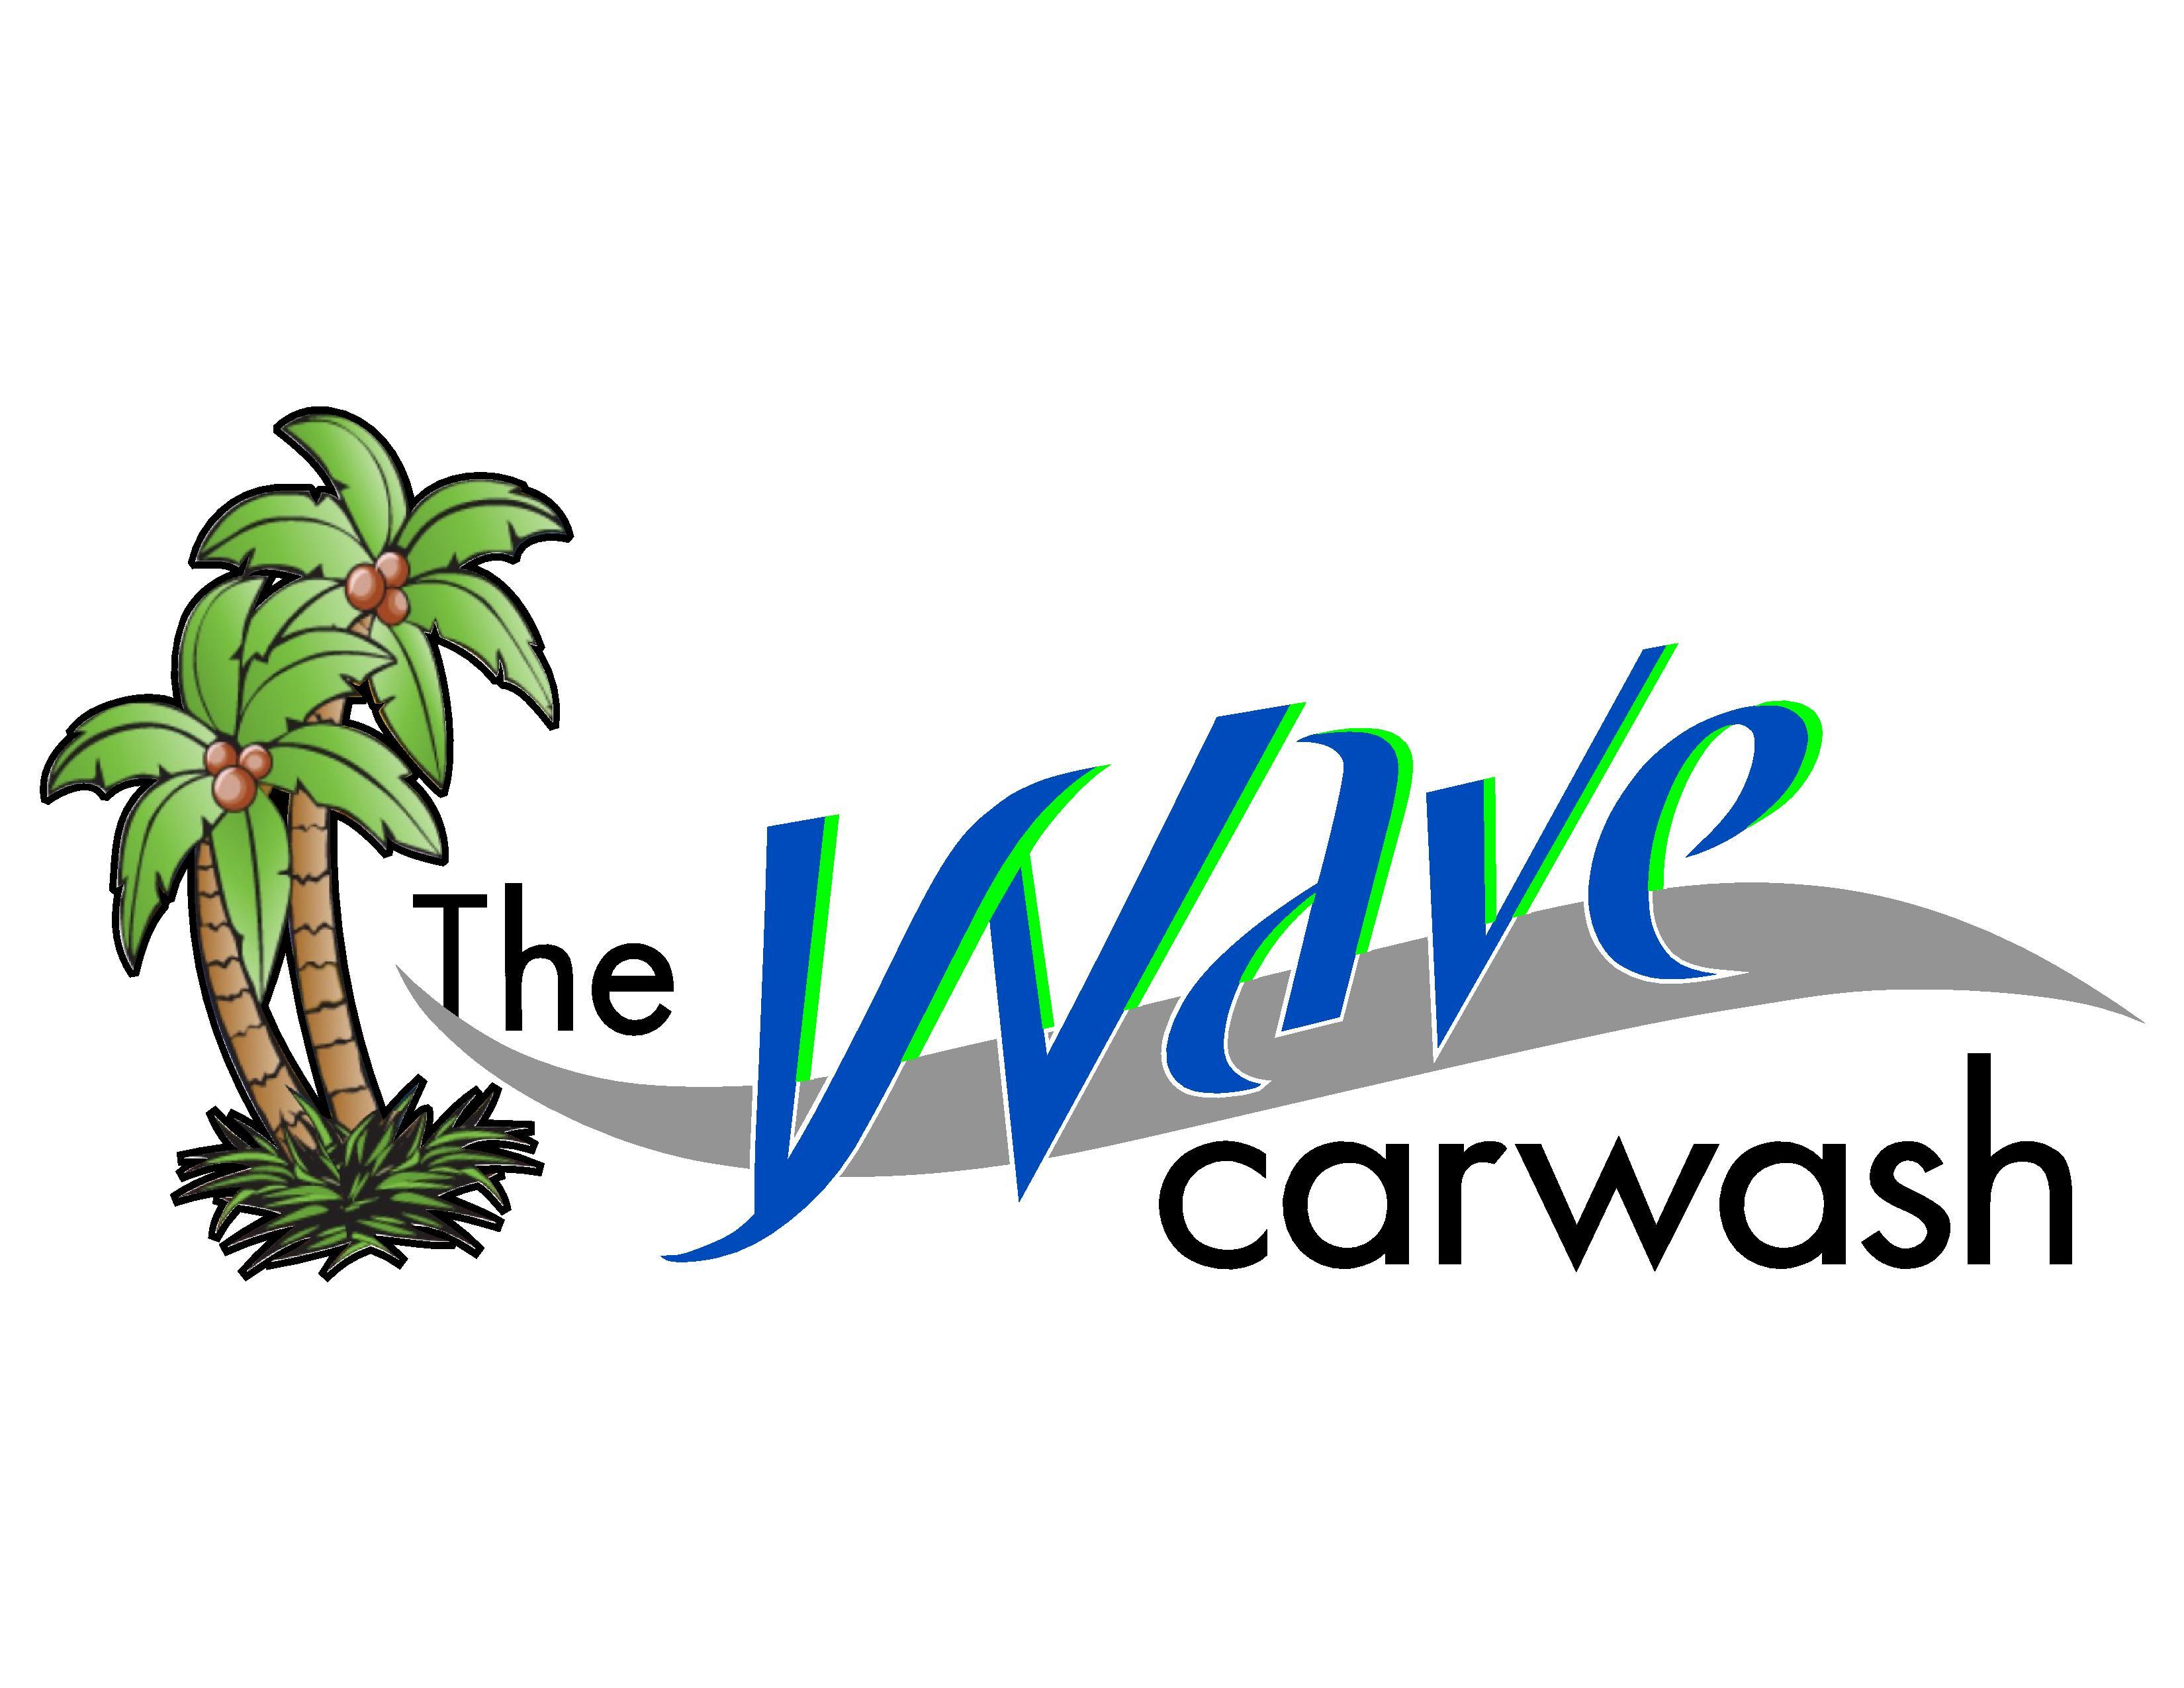 The wave car wash professional express exterior car wash solutioingenieria Choice Image